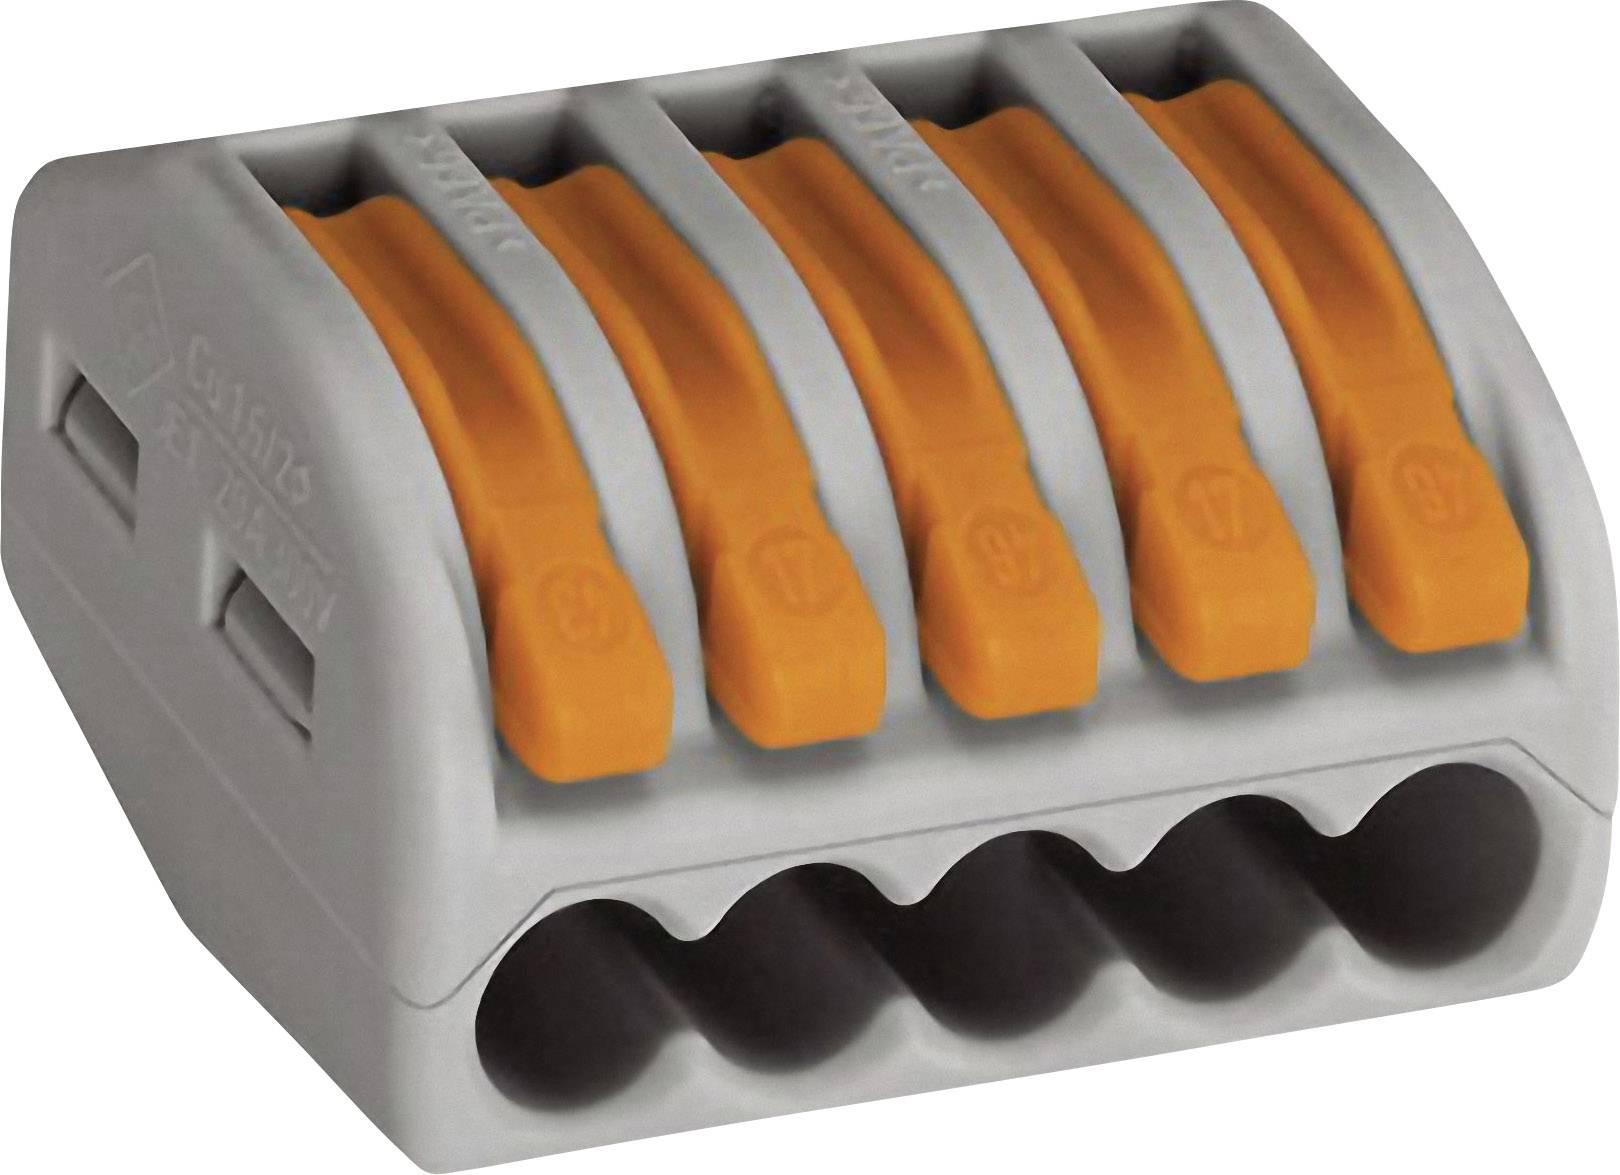 Krabicová svorkovnica WAGO 222 na kábel s rozmerom 0.08-4 mm², pólů 5, 40 ks, sivá, oranžová